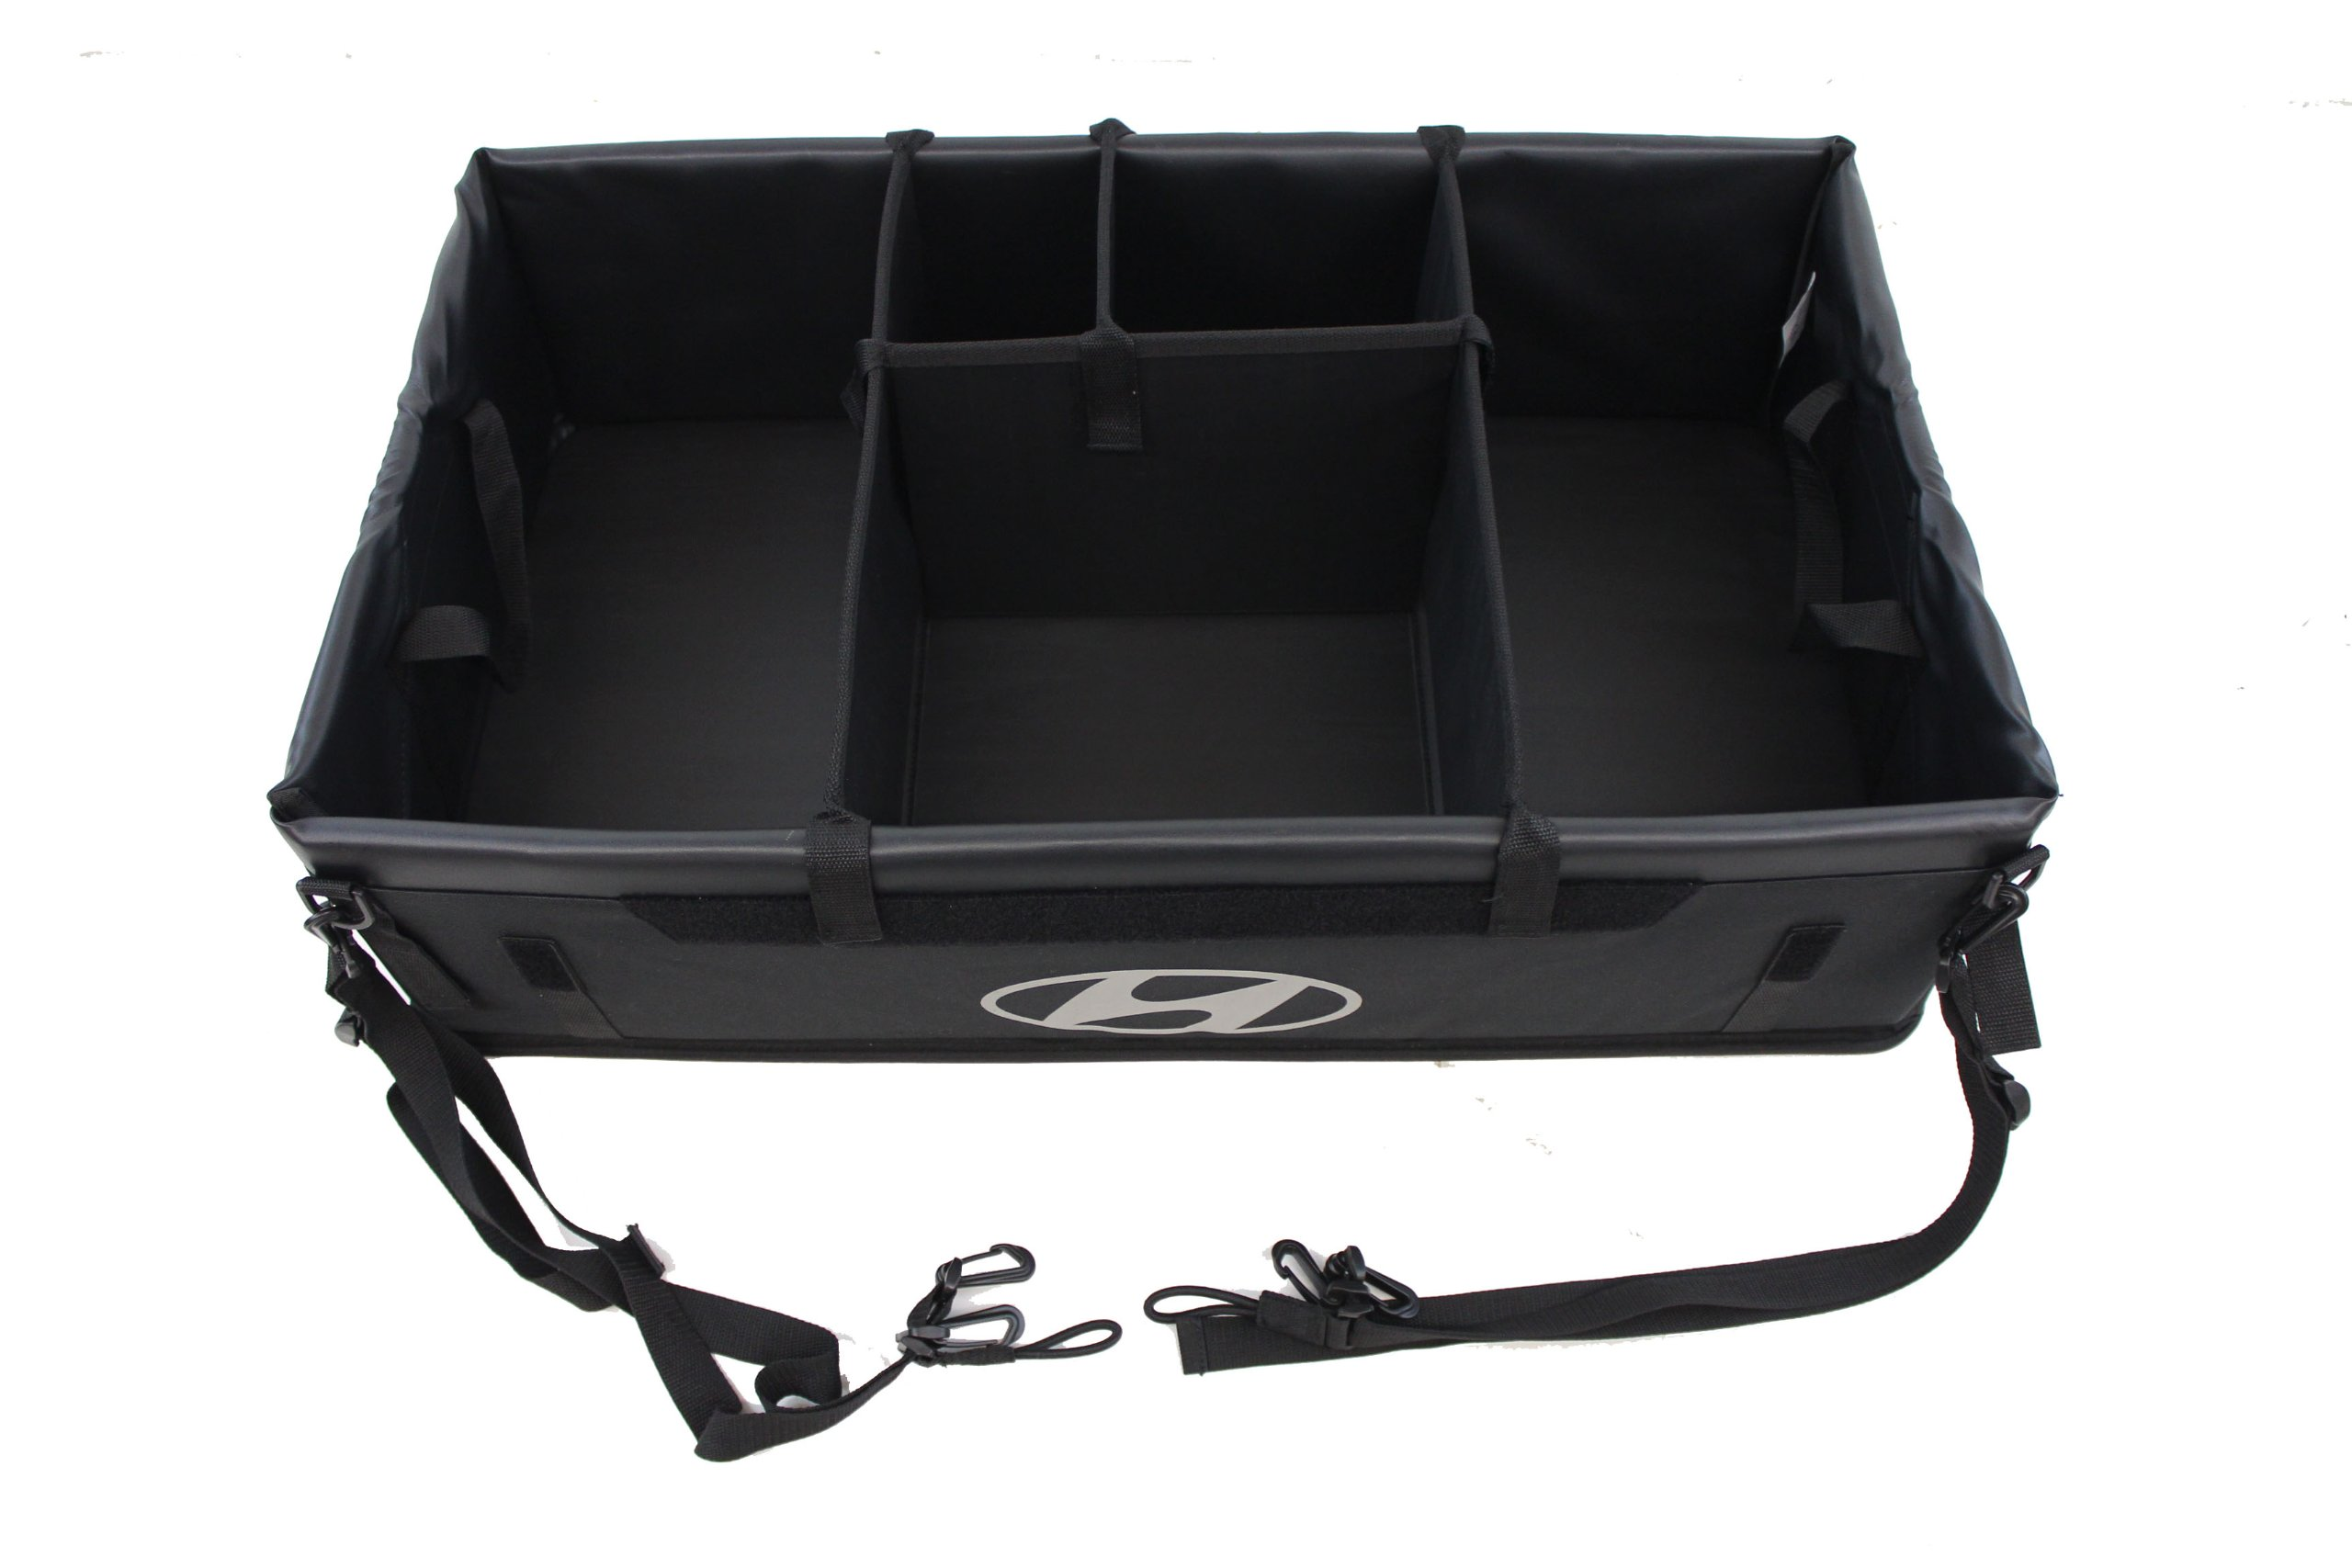 Genuine Hyundai Accessories 00012-ADU00 Cargo Organizer